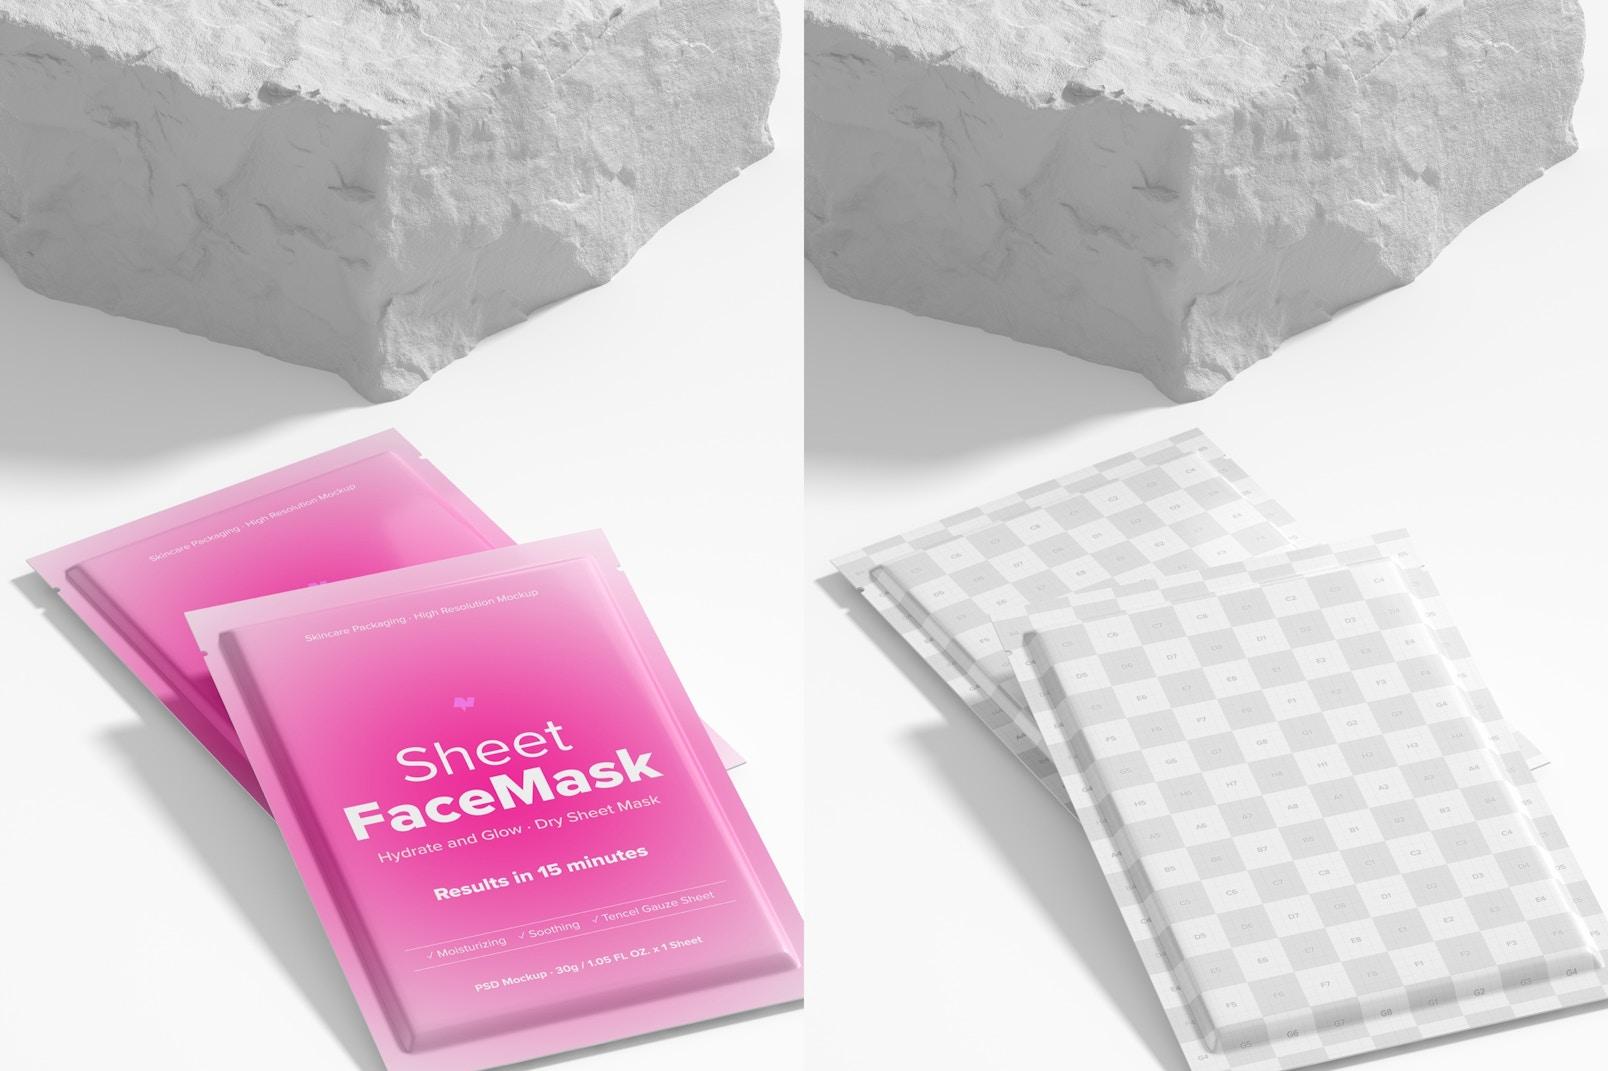 Sheet Face Mask Scene Mockup 02